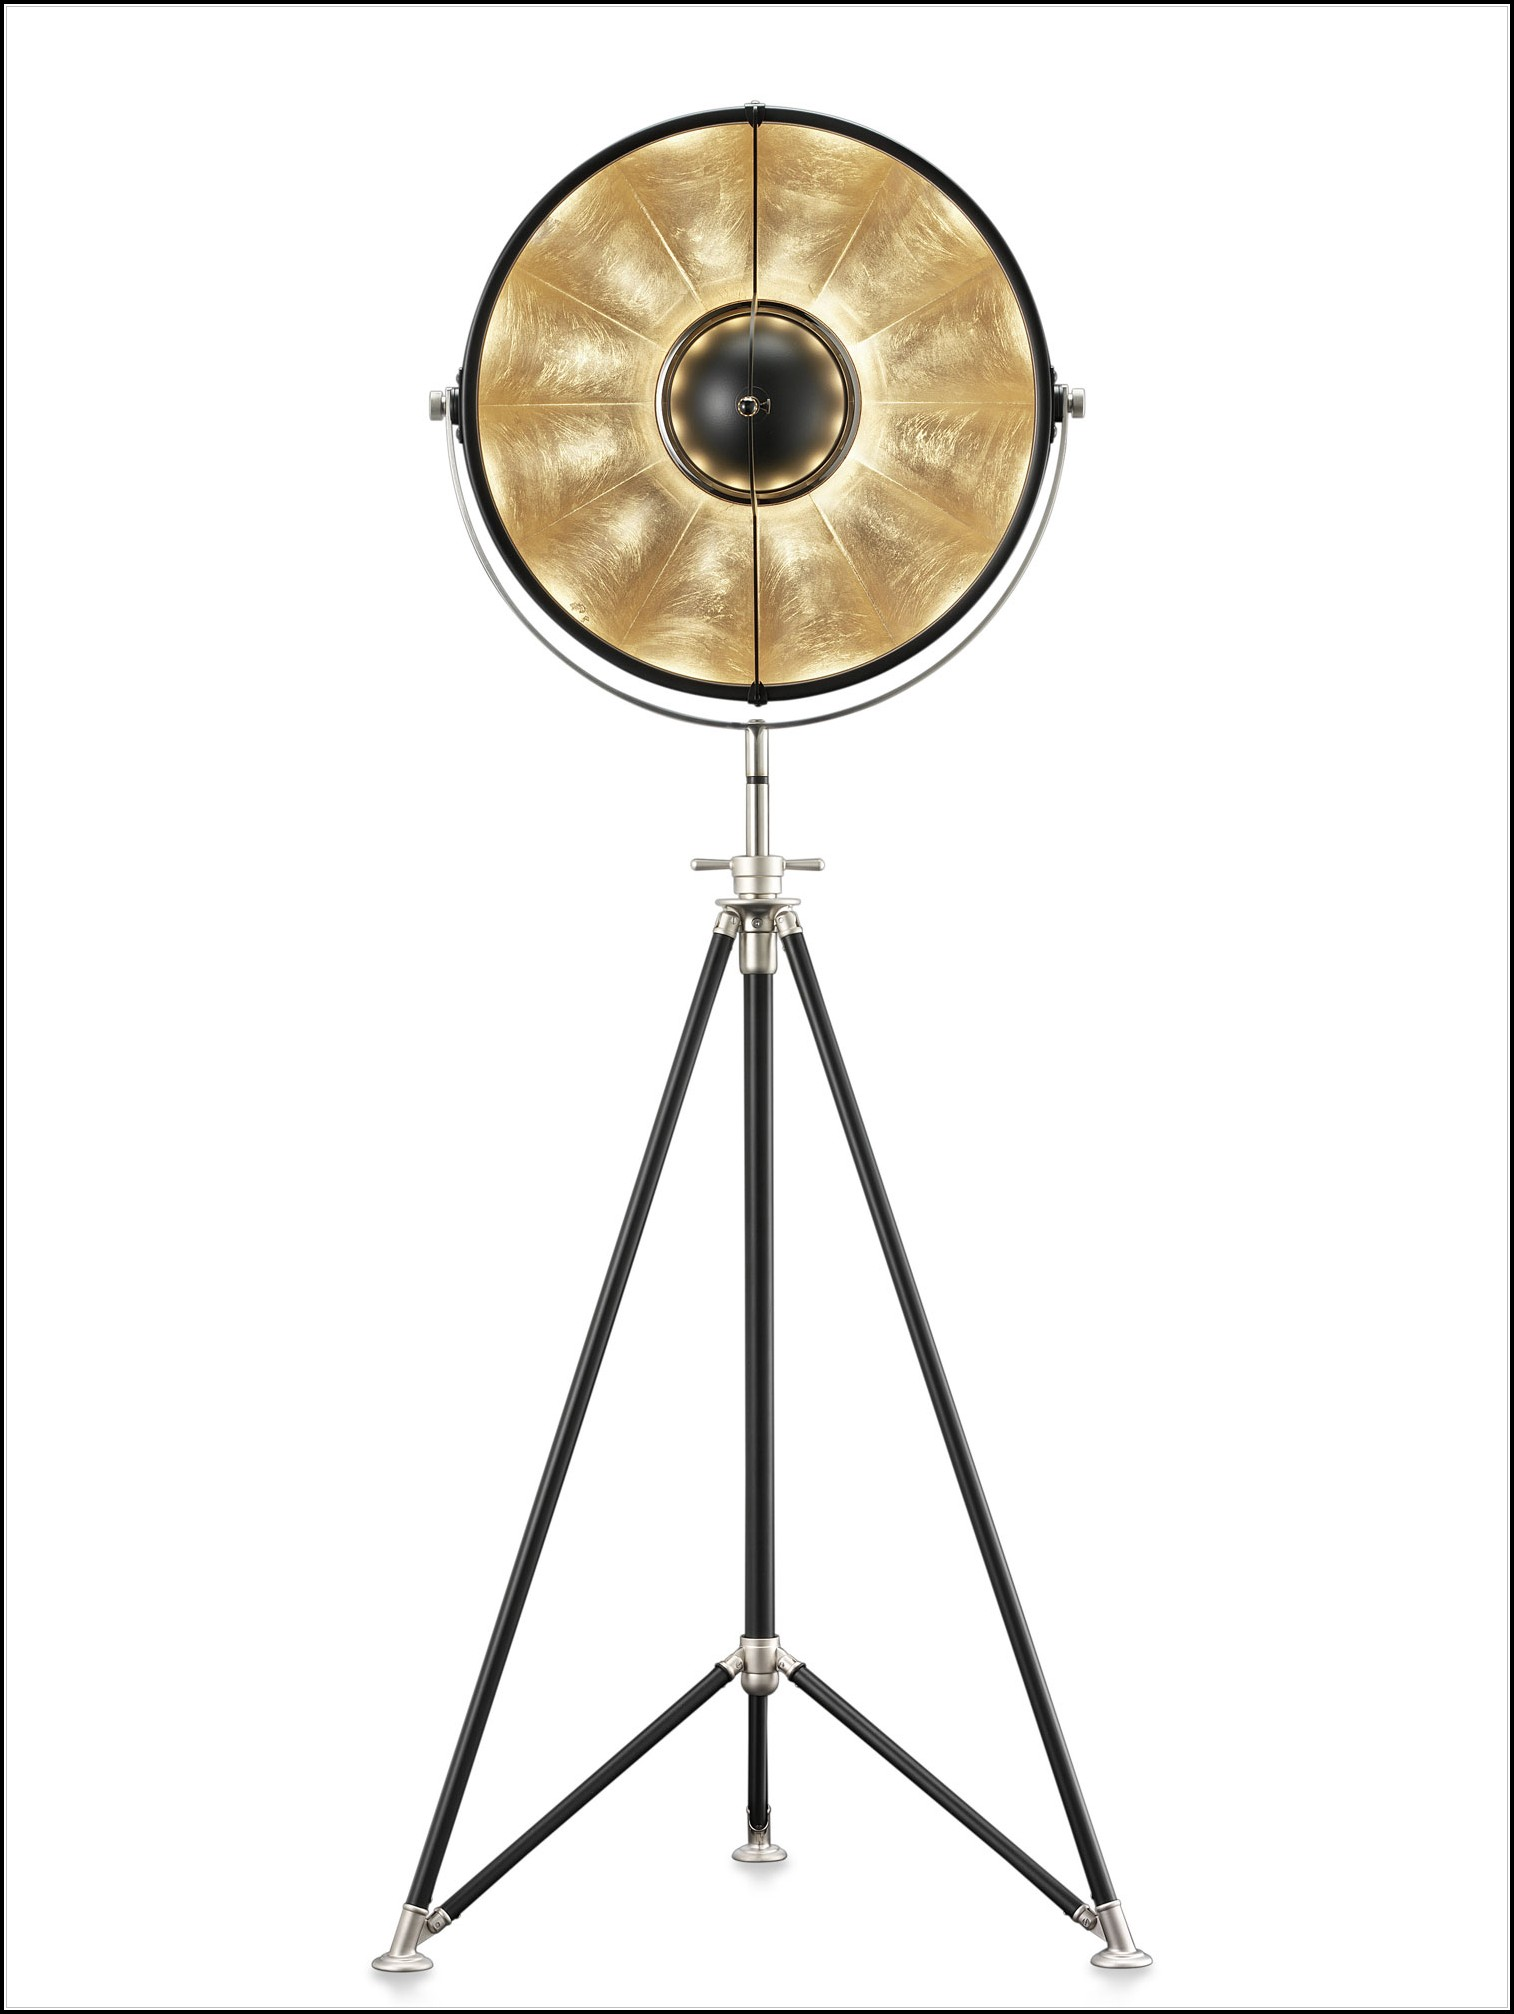 Retro Tripod Studio Floor Lamp